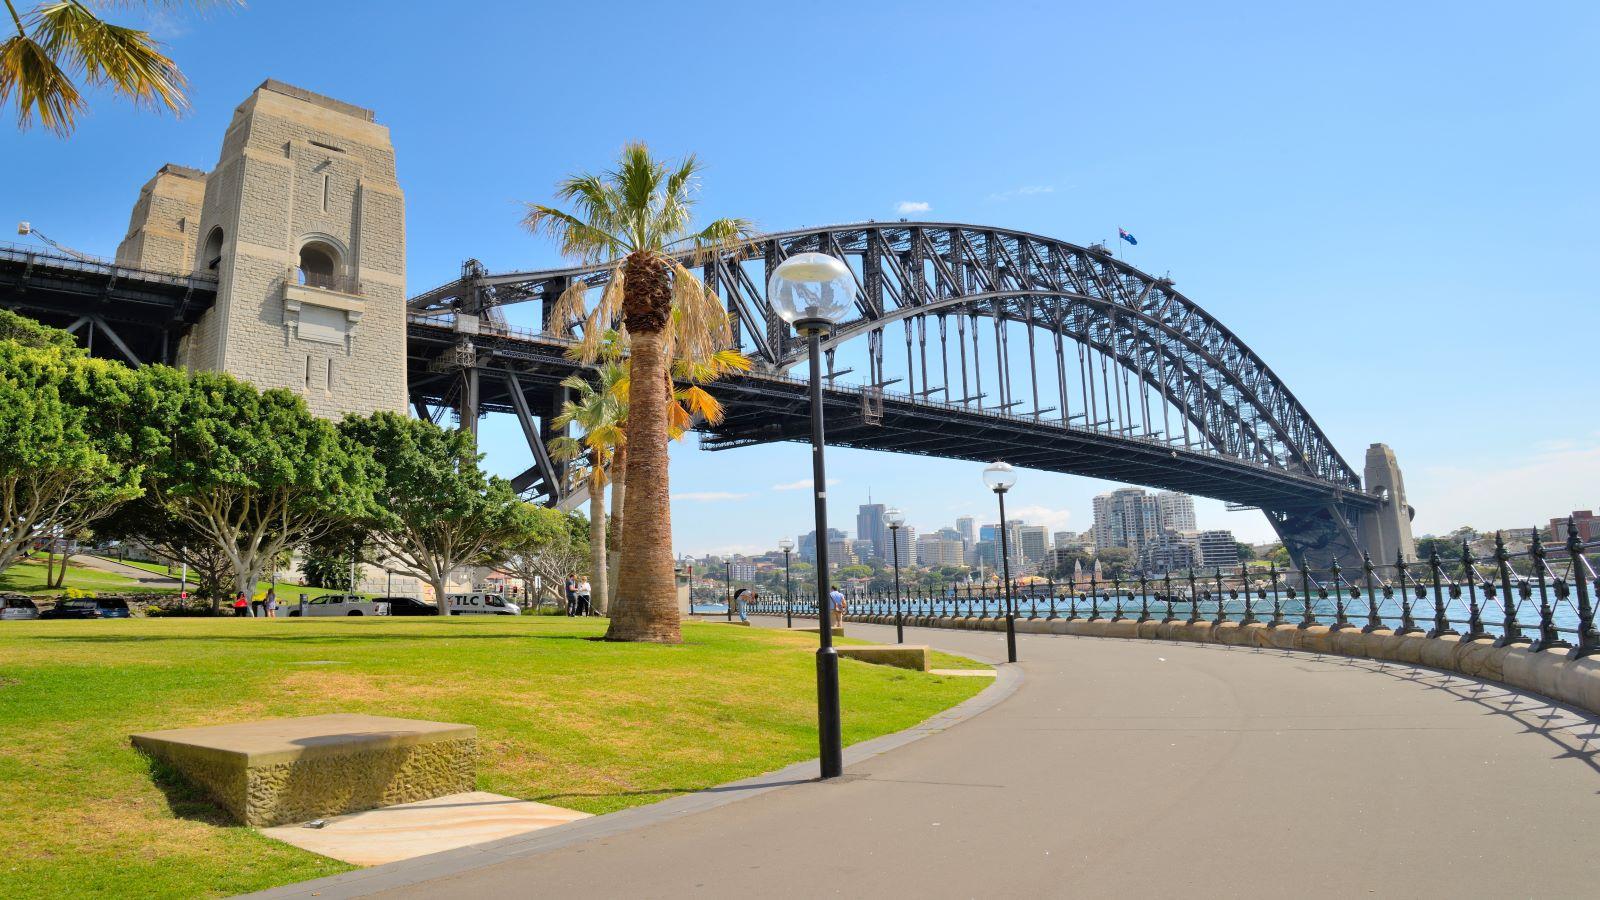 Side view of Sydney Harbour bridge in bright blue sky.